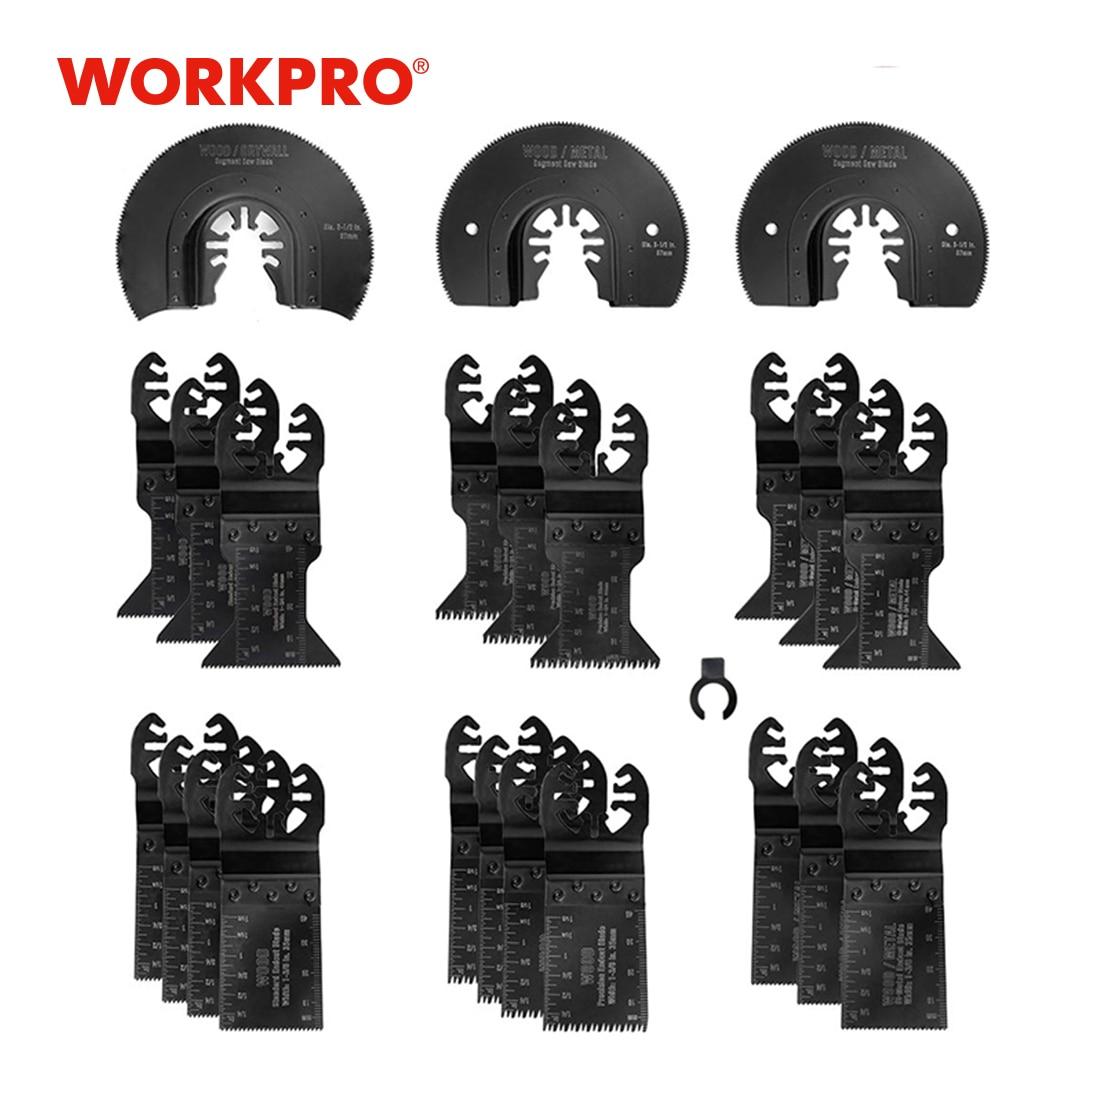 WORKPRO 23 قطعة متعددة تتأرجح شفرات المنشار للمعادن الخشب الإفراج السريع شفرات المنشار شفرات المنشار متعددة المهام